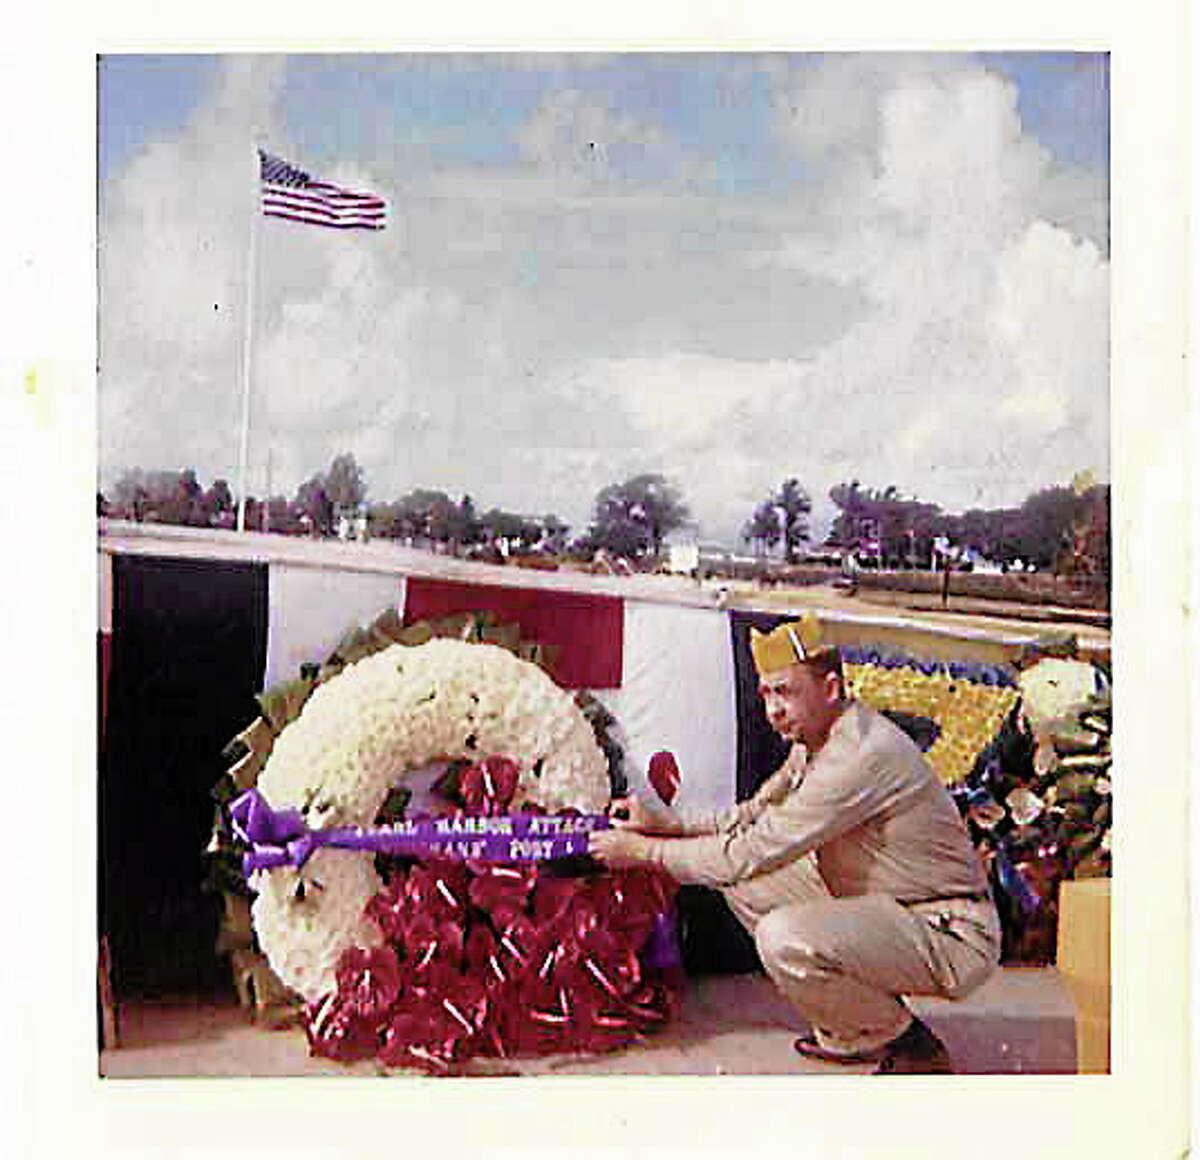 Joseph P. McDonald at the Arizona Memorial on Dec. 7, 1961.